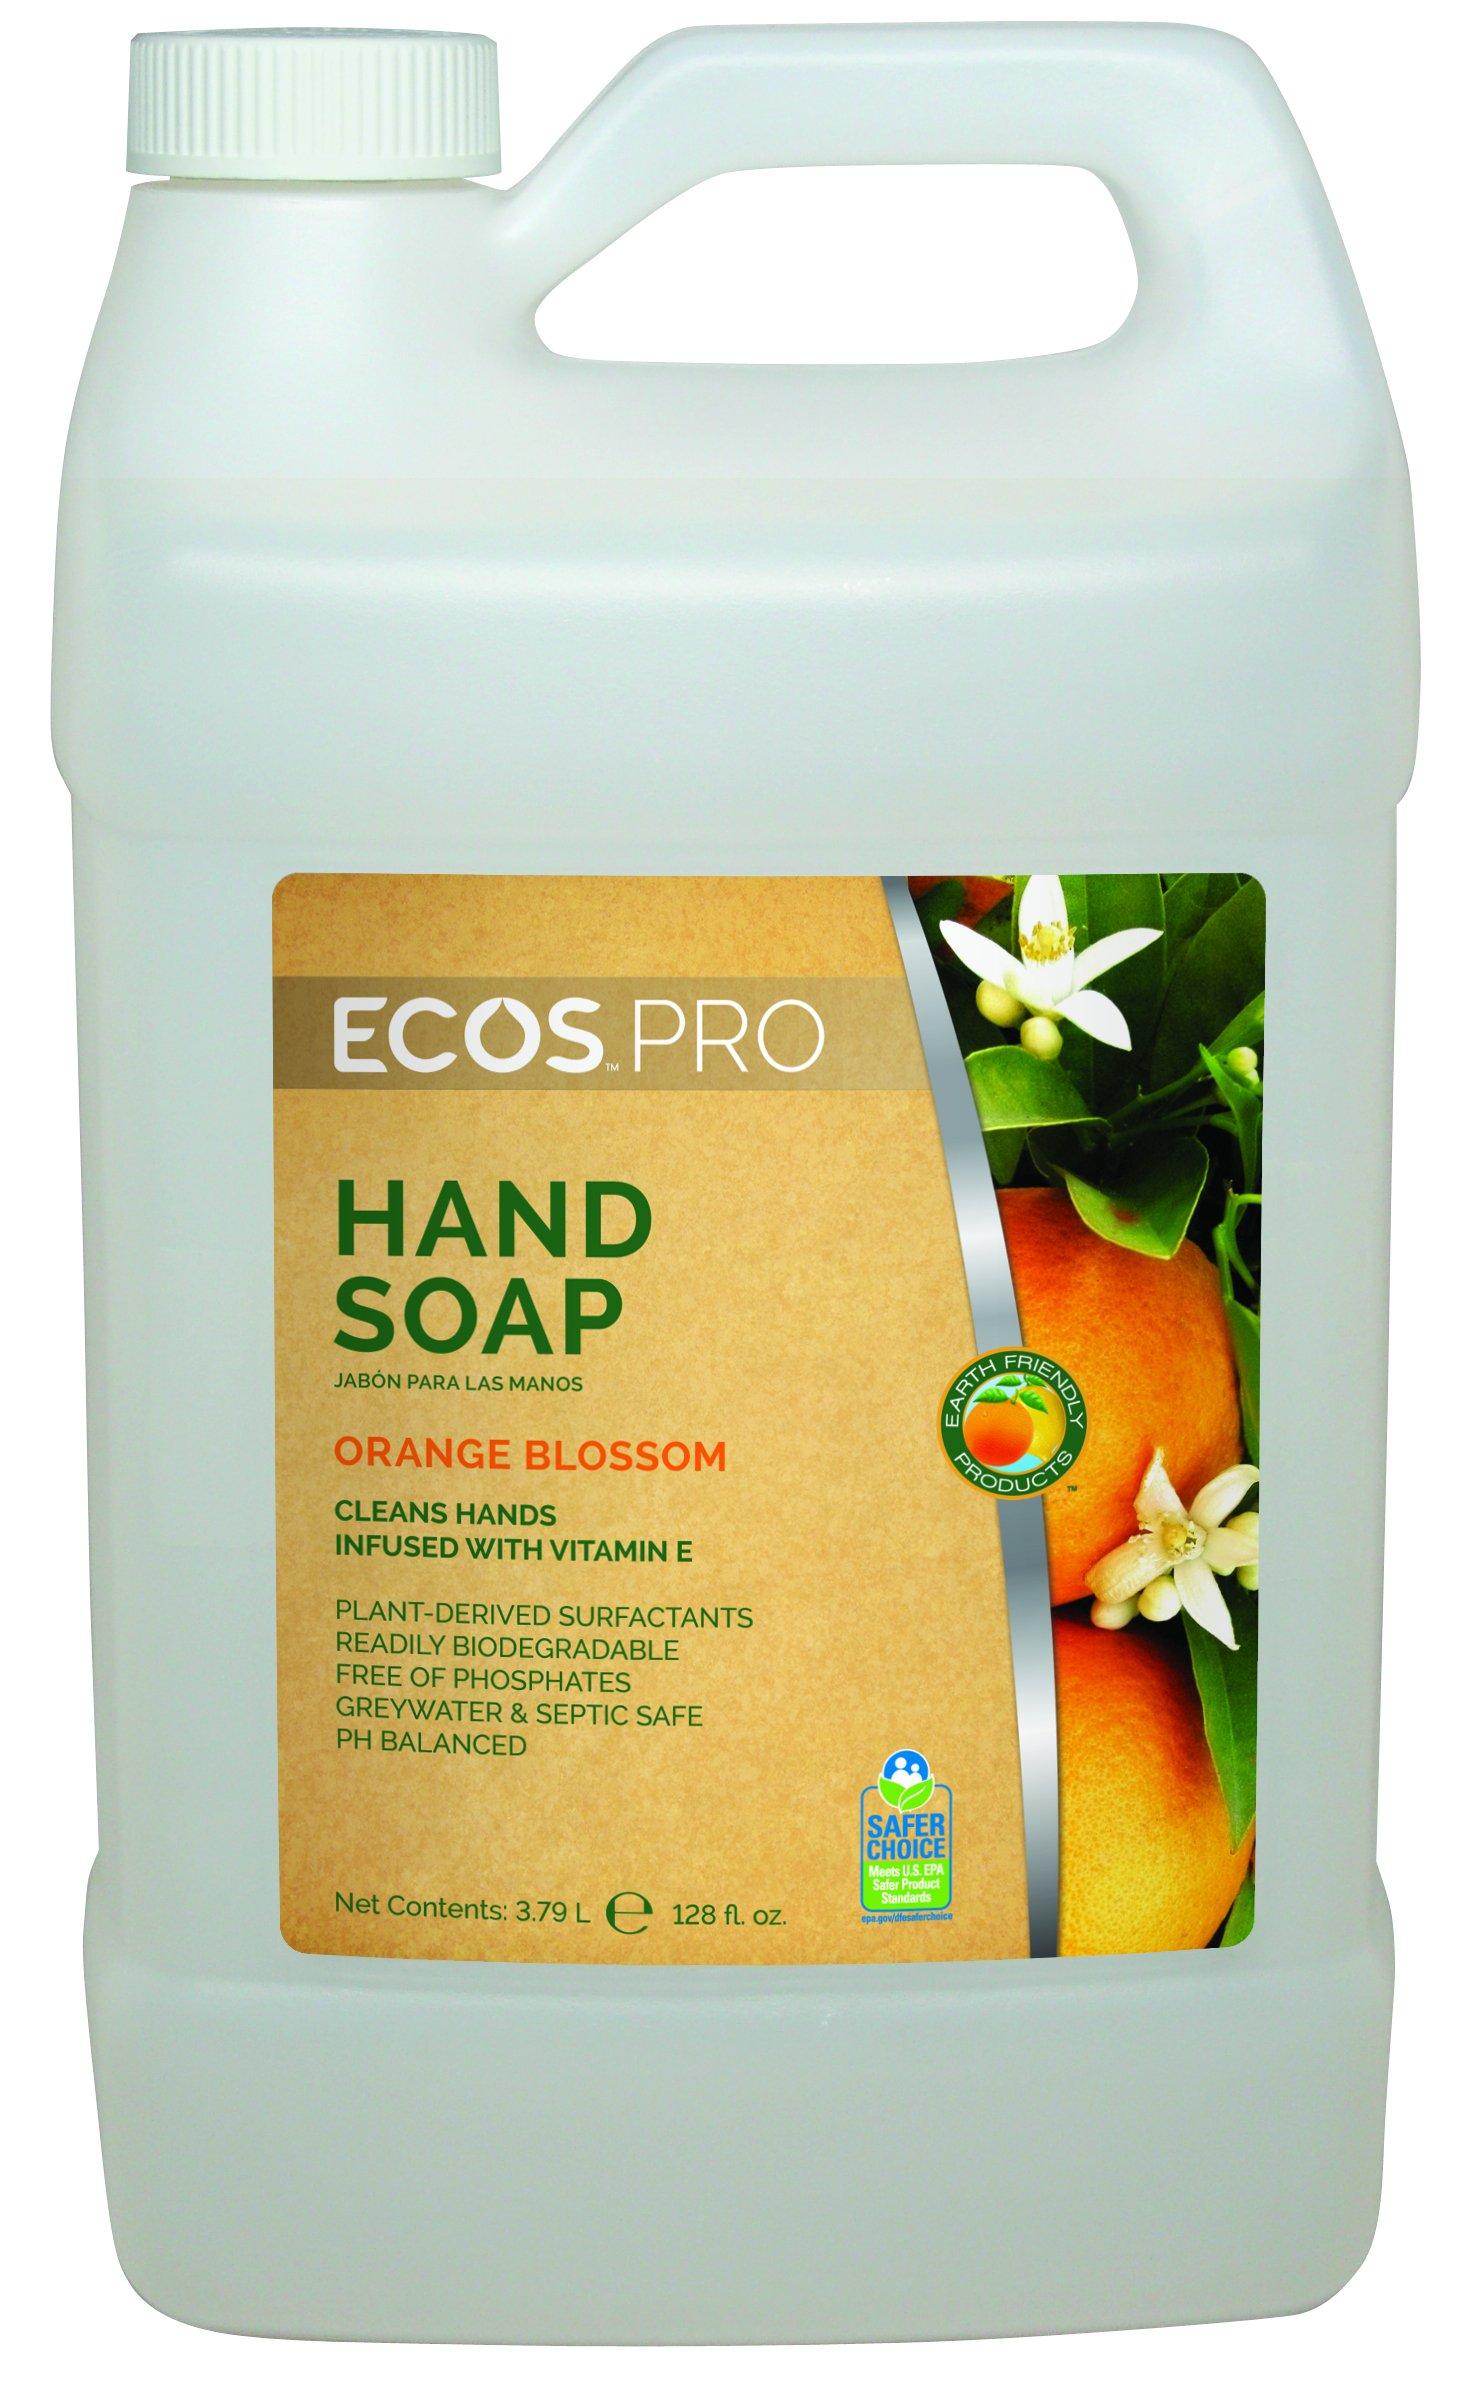 ECOS PRO PL9484/04 Hand Soap, Orange Blossom (Pack of 4)